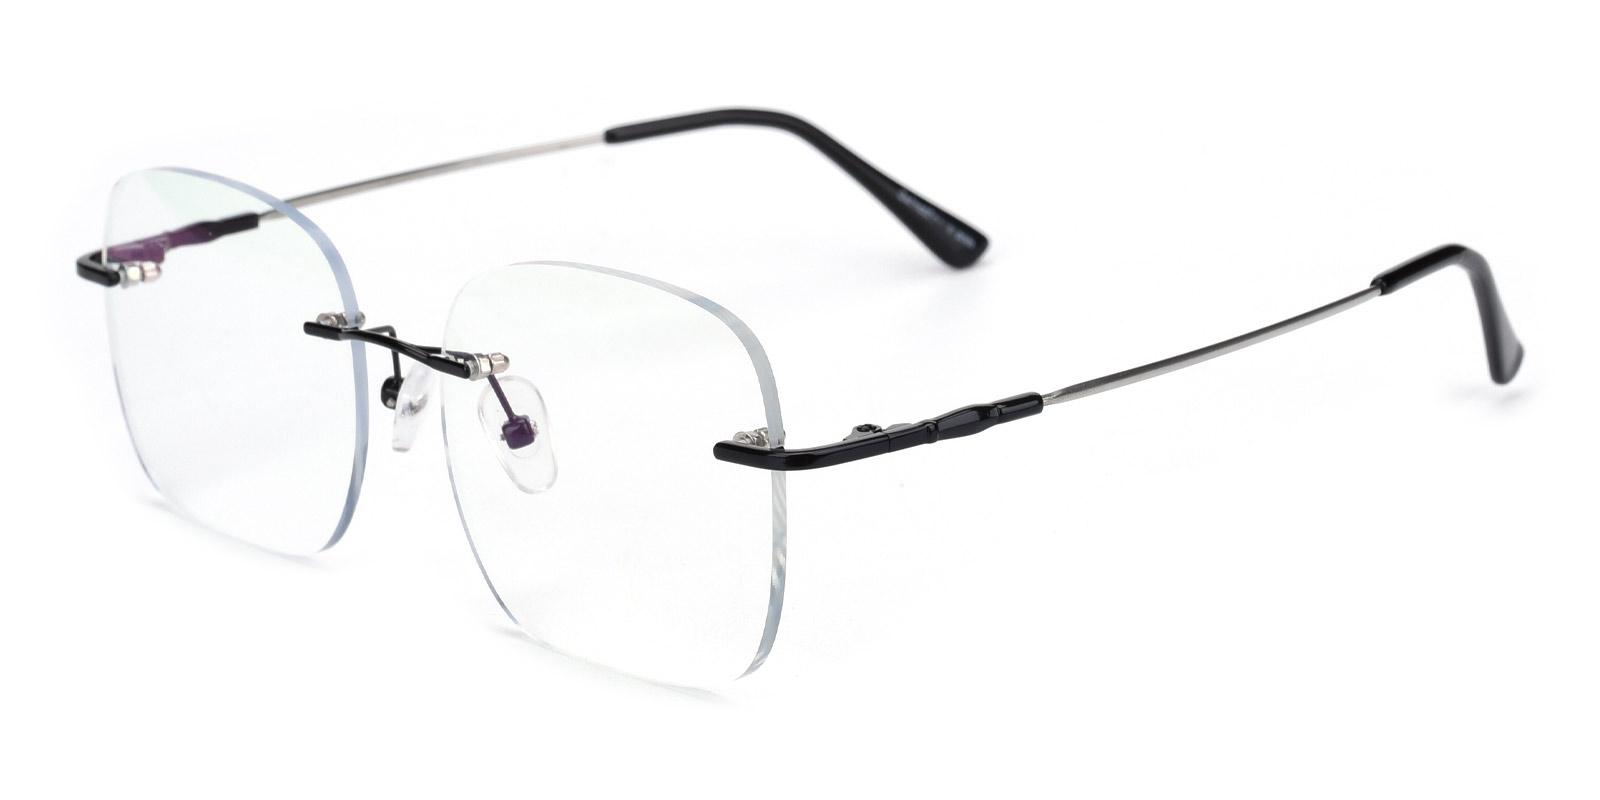 Invisibles-Black-Rectangle-Metal-Eyeglasses-detail